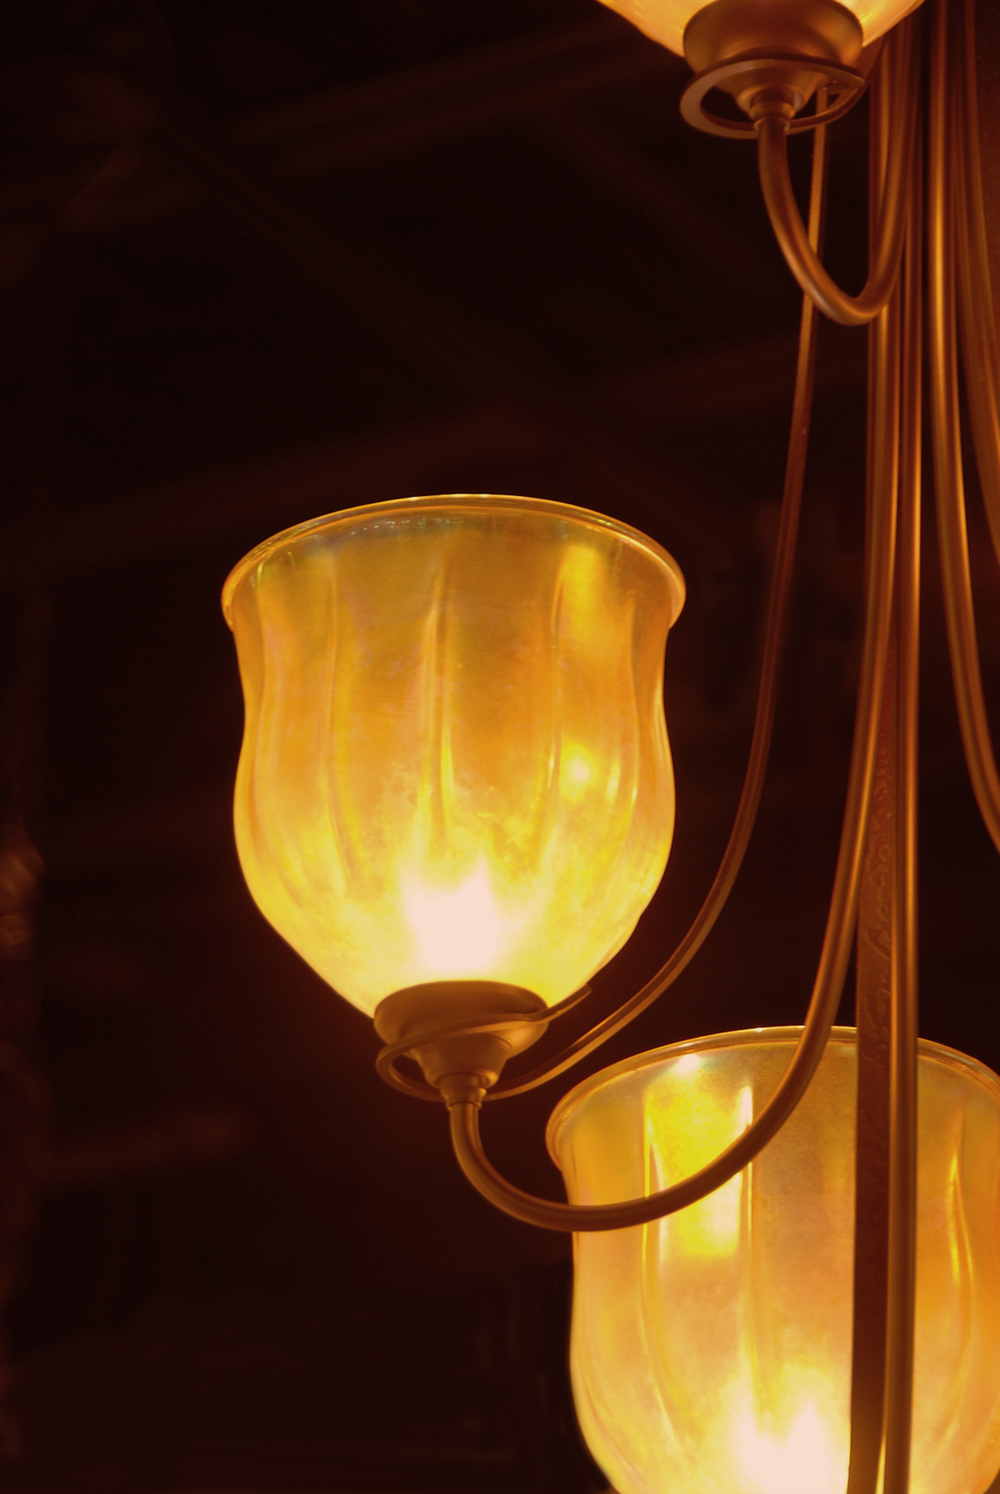 HF5 light close up rick strini .jpg